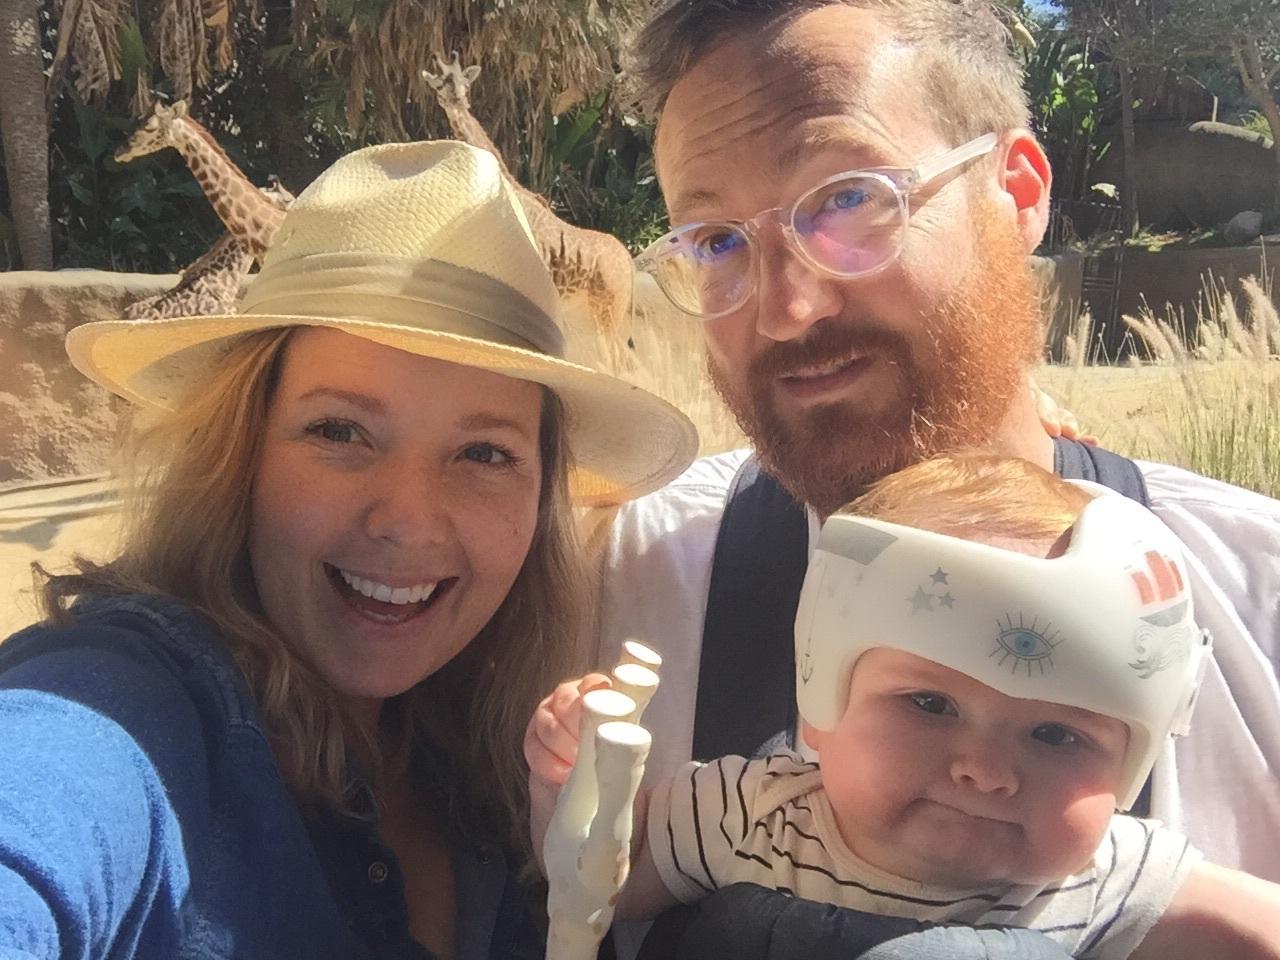 Awkwardly awesome family selfie